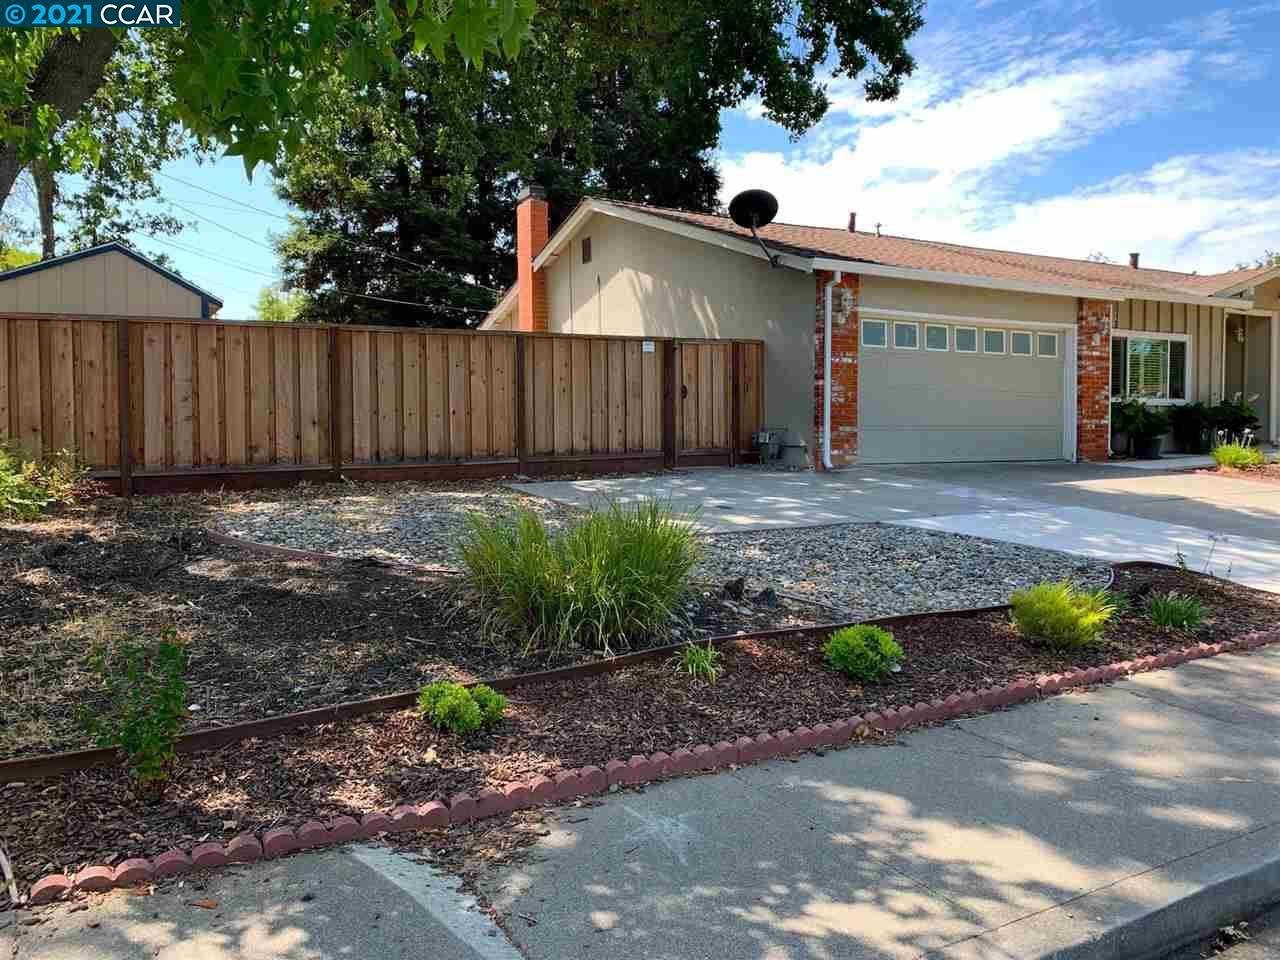 Photo of 975 Savannah Cir, WALNUT CREEK, CA 94598 (MLS # 40961036)